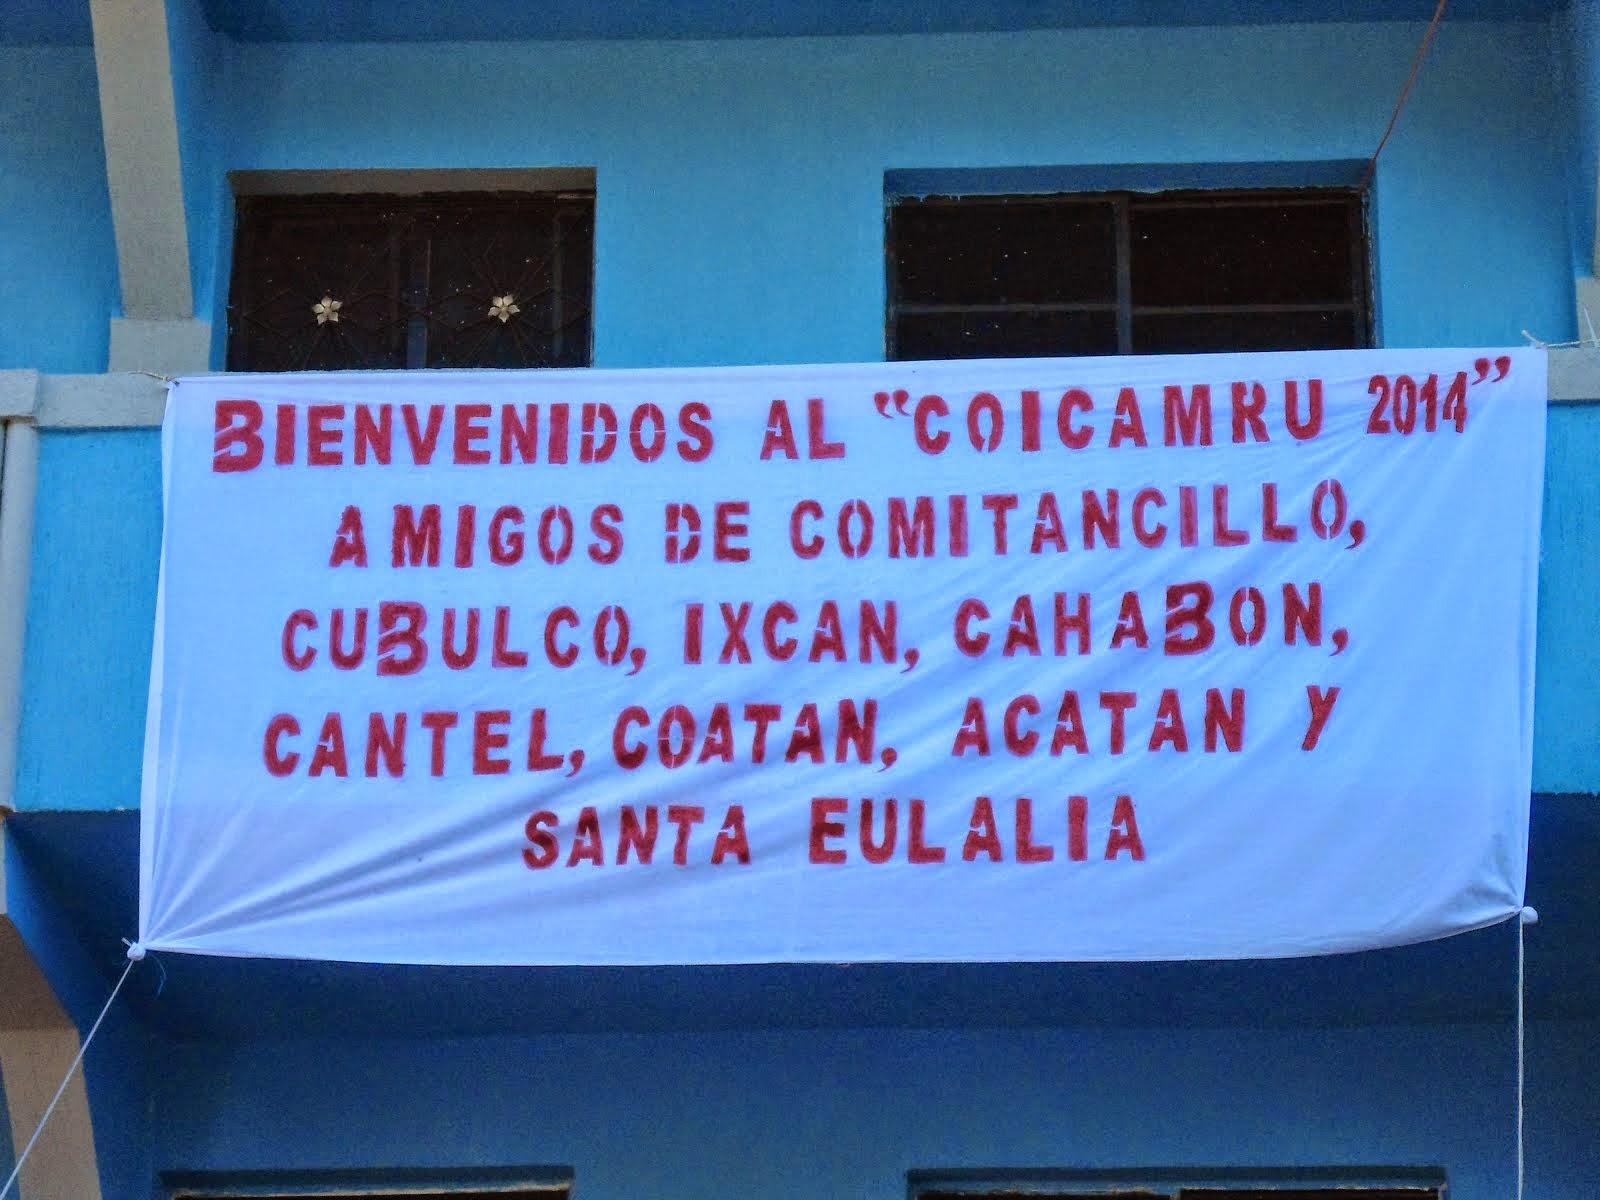 COICAMRU-2014